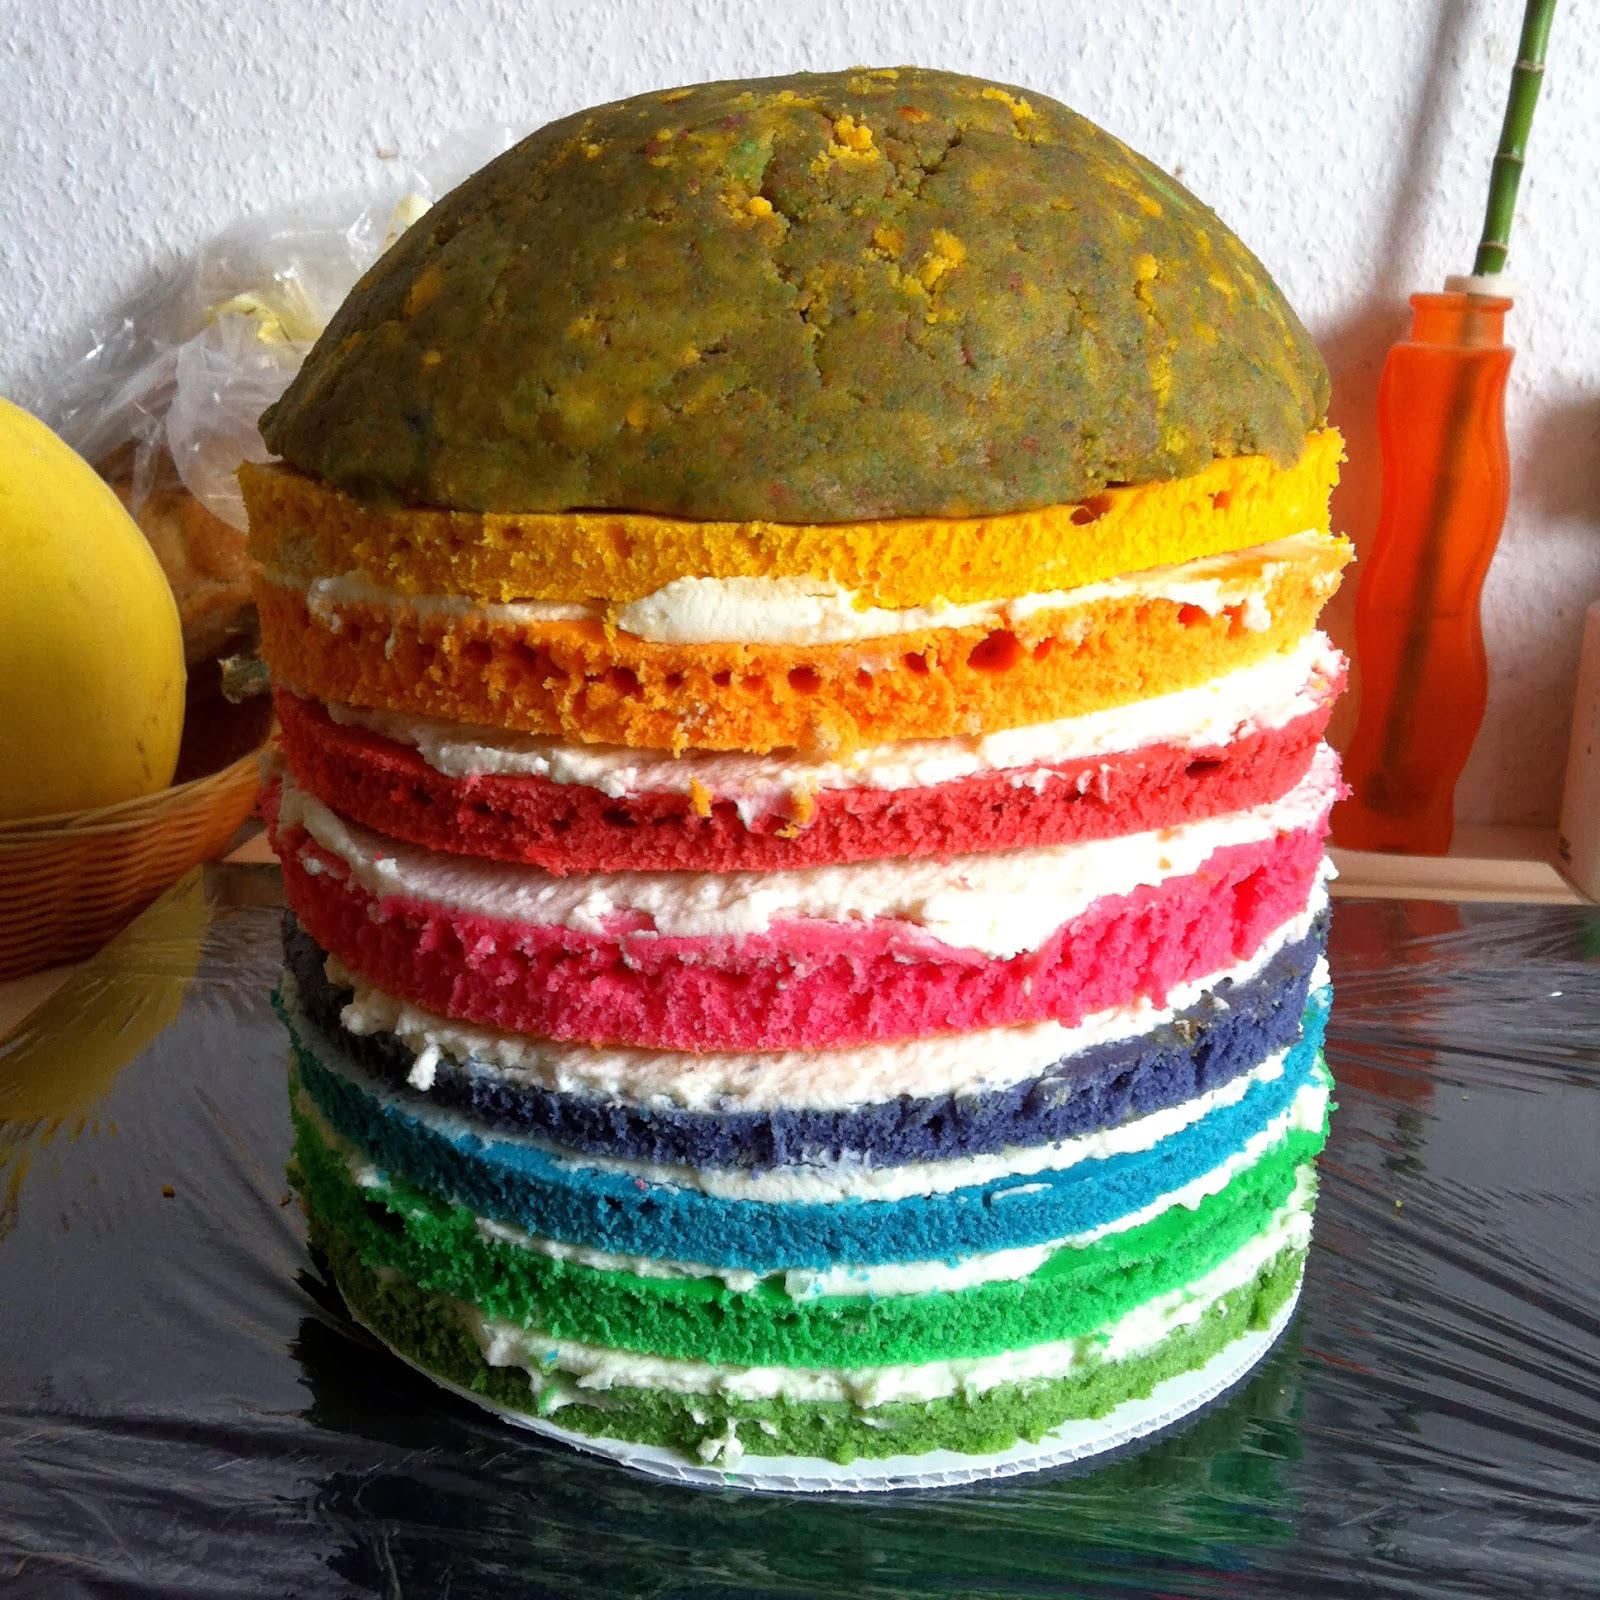 Lanisleckerecke R2d2 Regenbogentorte